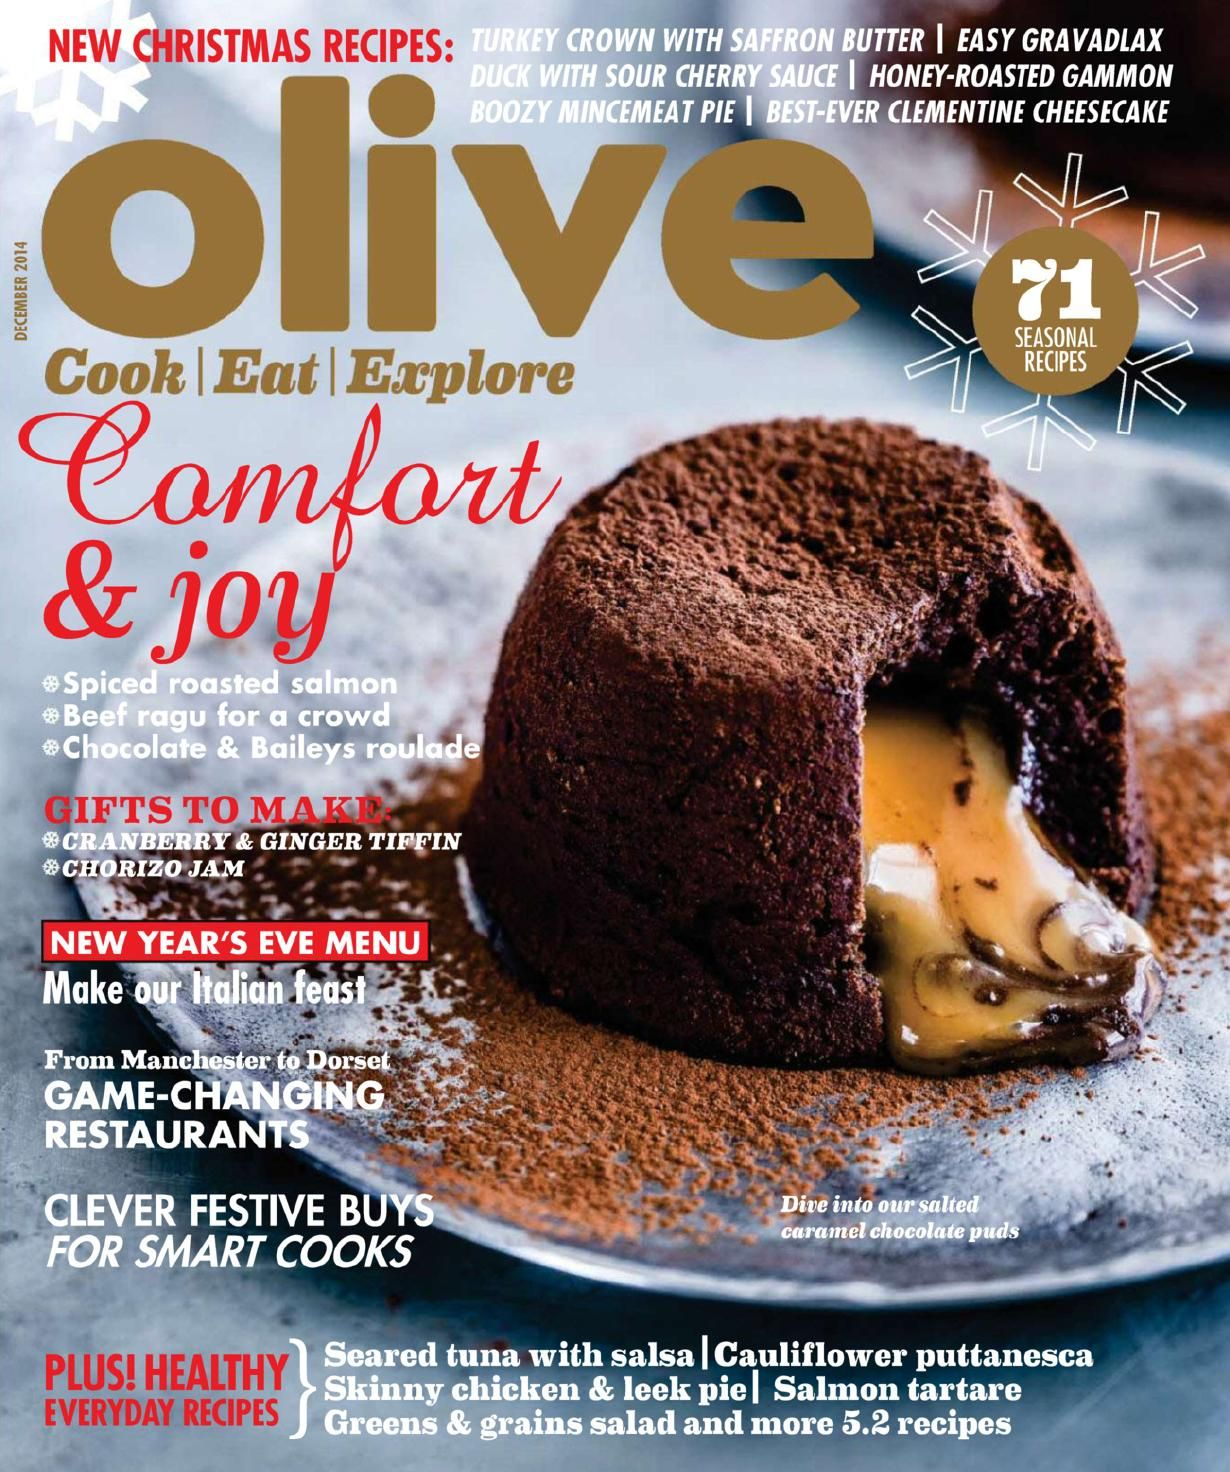 Olive Magazine December 2014 Food Food Magazine Food Magazines Cover